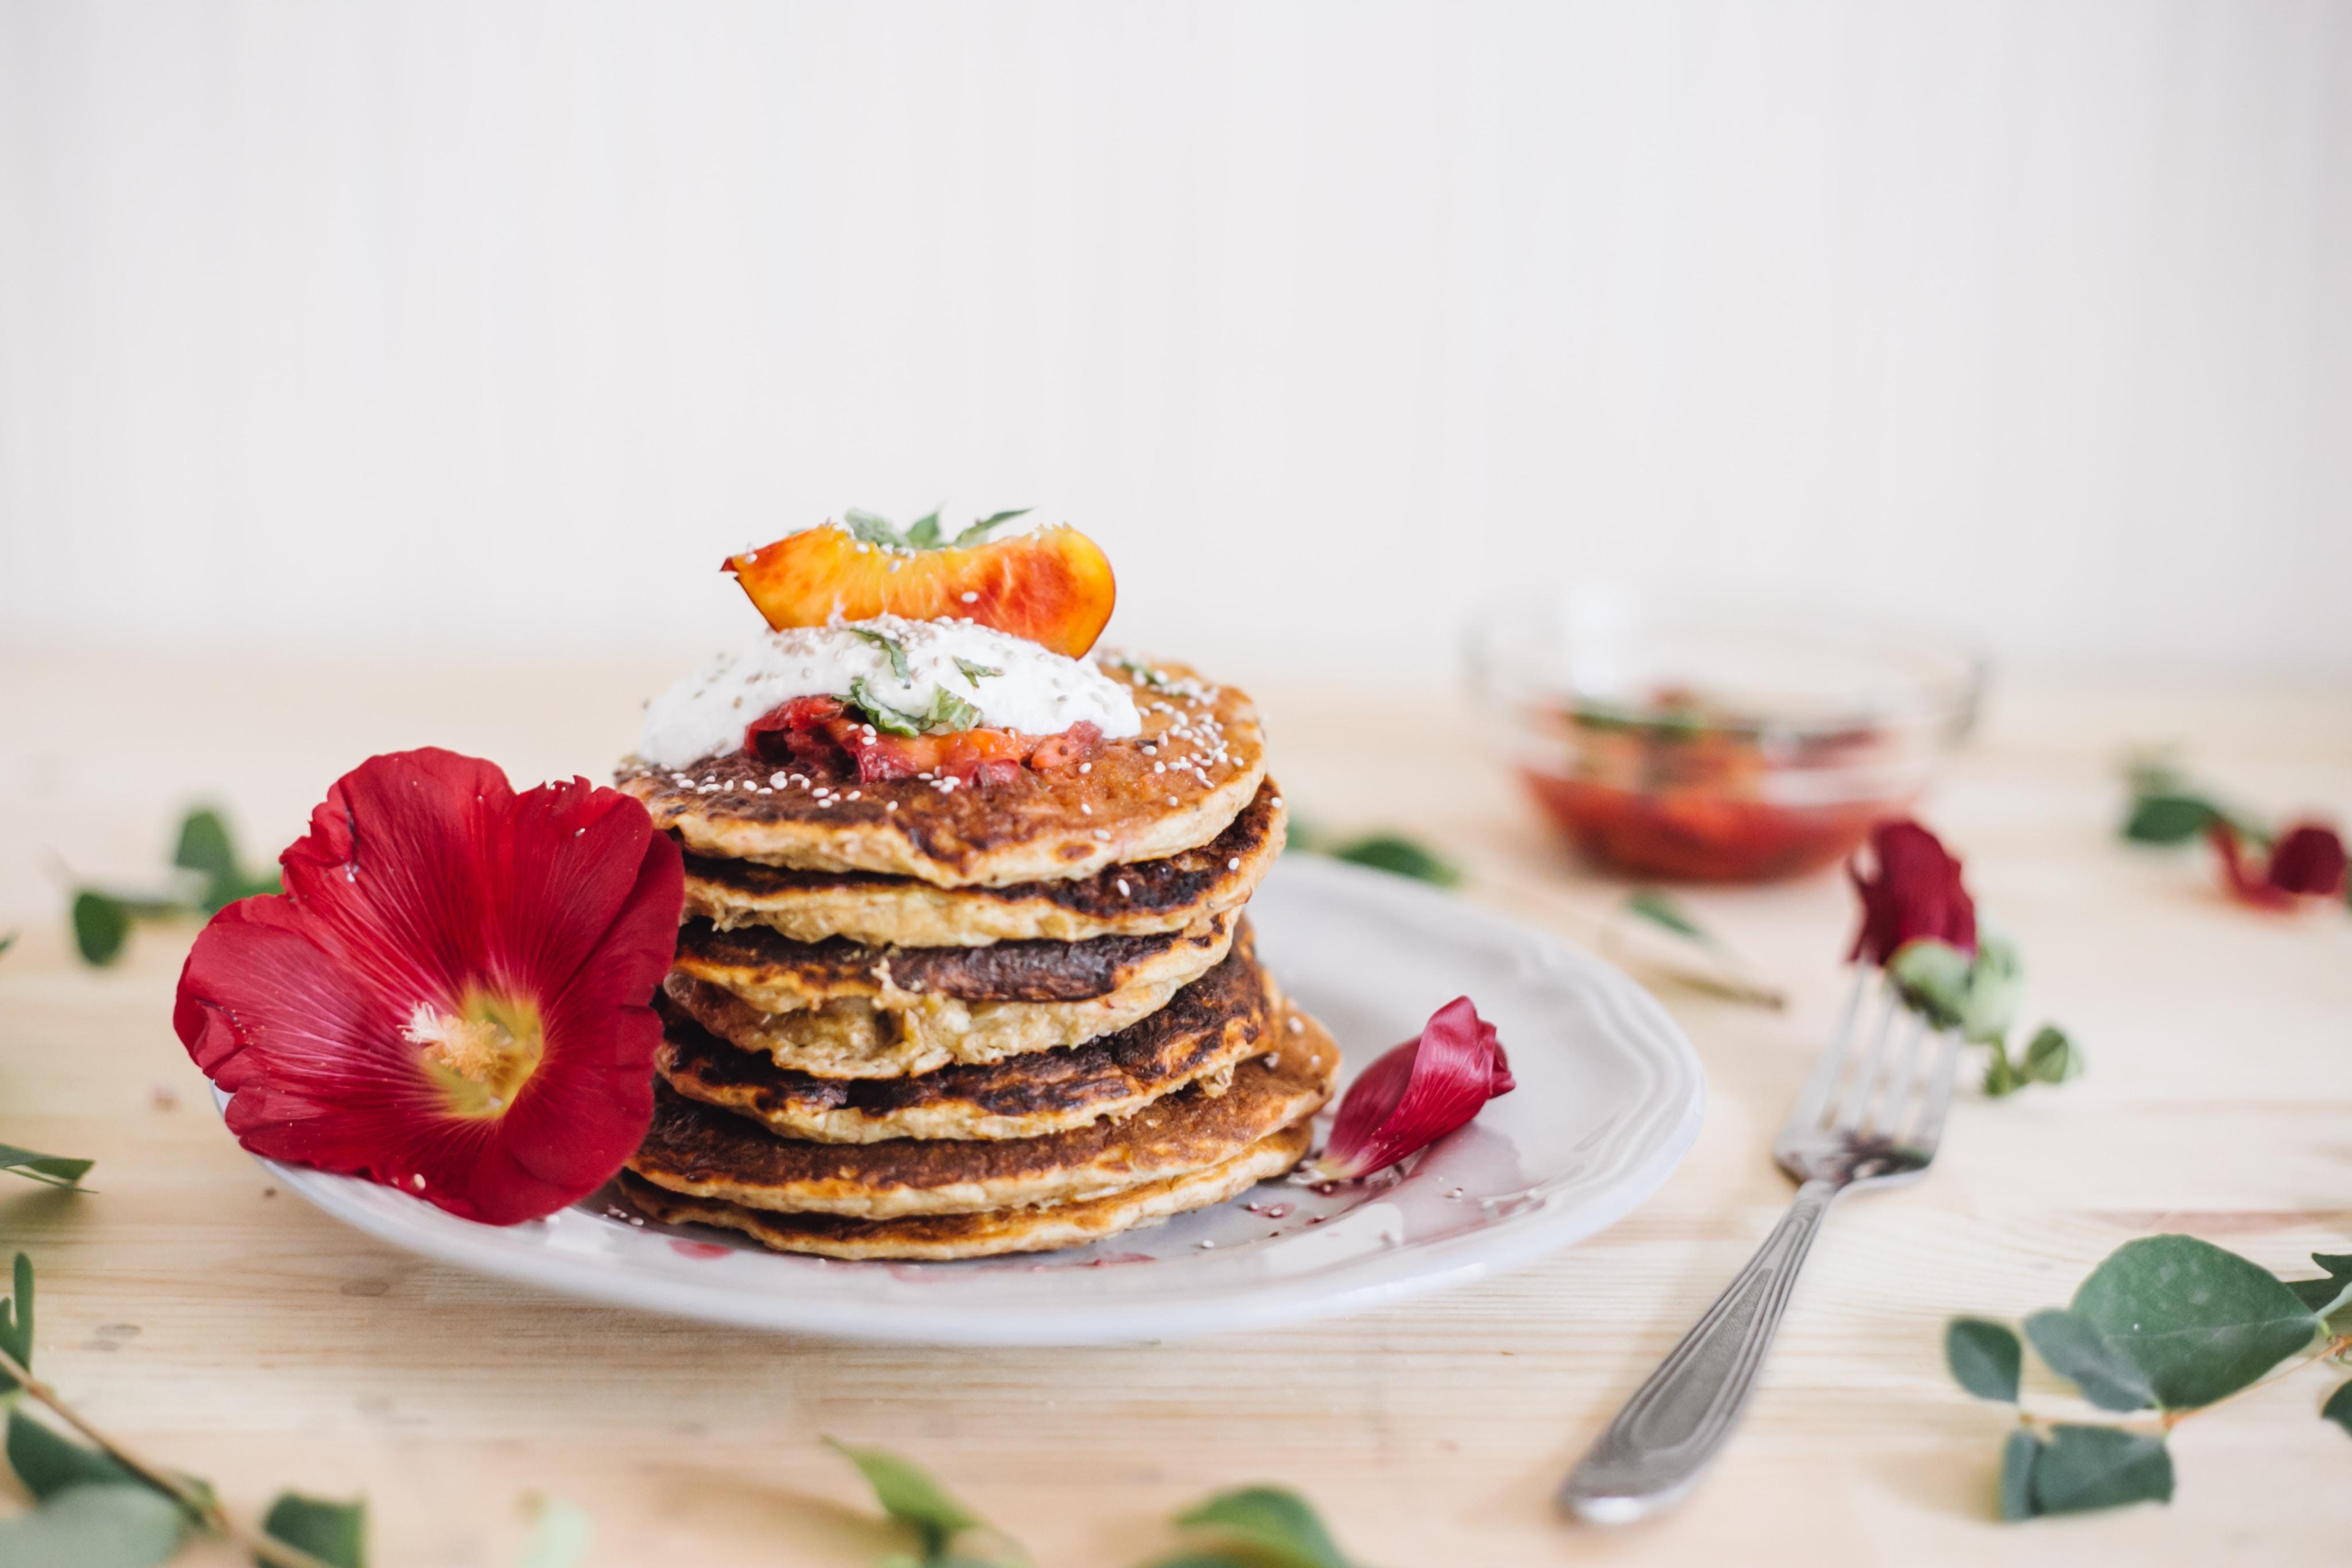 pancakes on plate beside fork